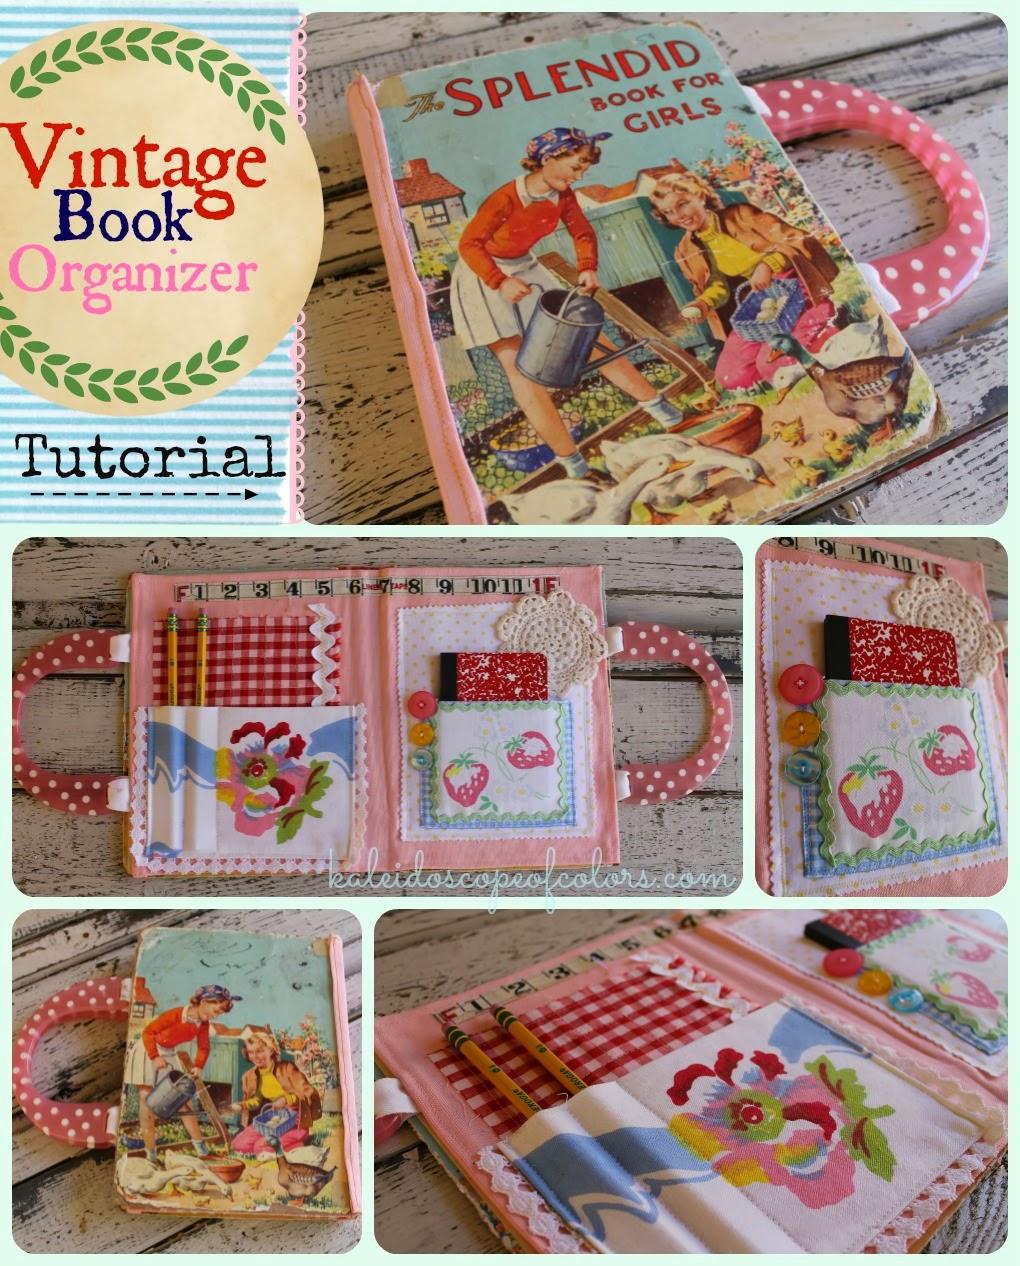 Vintage Book Cover Tutorial : Kaleidoscope of colors vintage book organizer tutorial